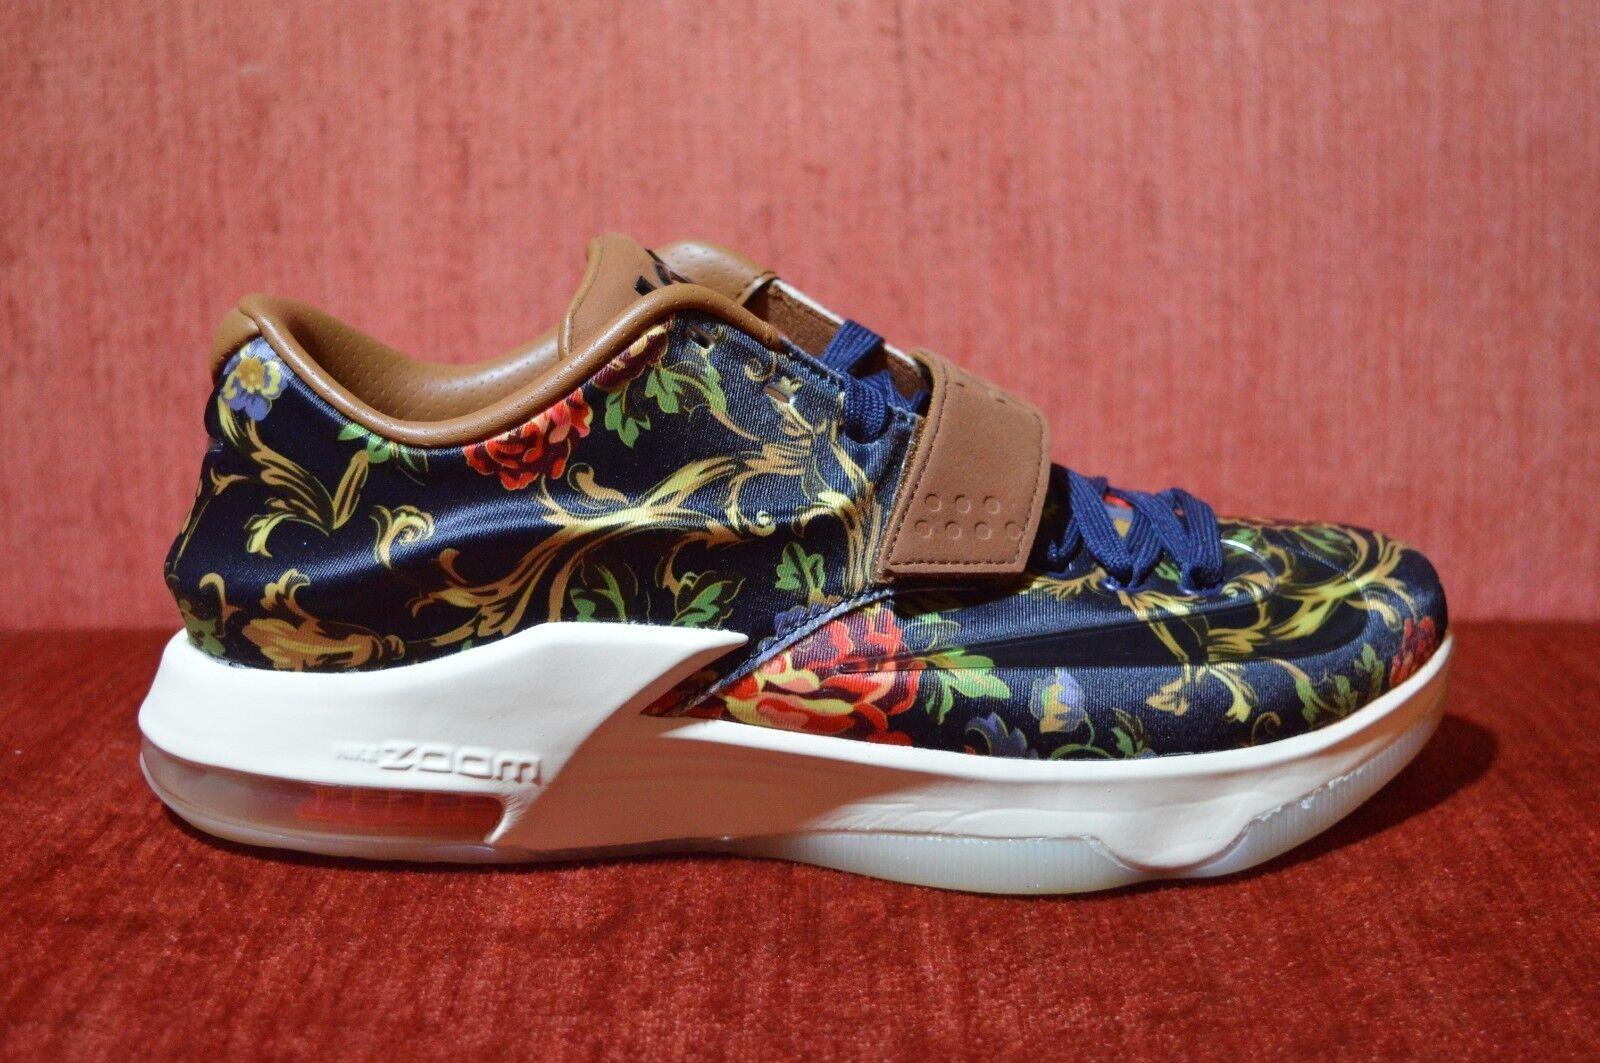 b08357f70906 WORN 1X Nike KD 7 EXT Floral Print Mens shoes shoes shoes Rare Size 9 726438